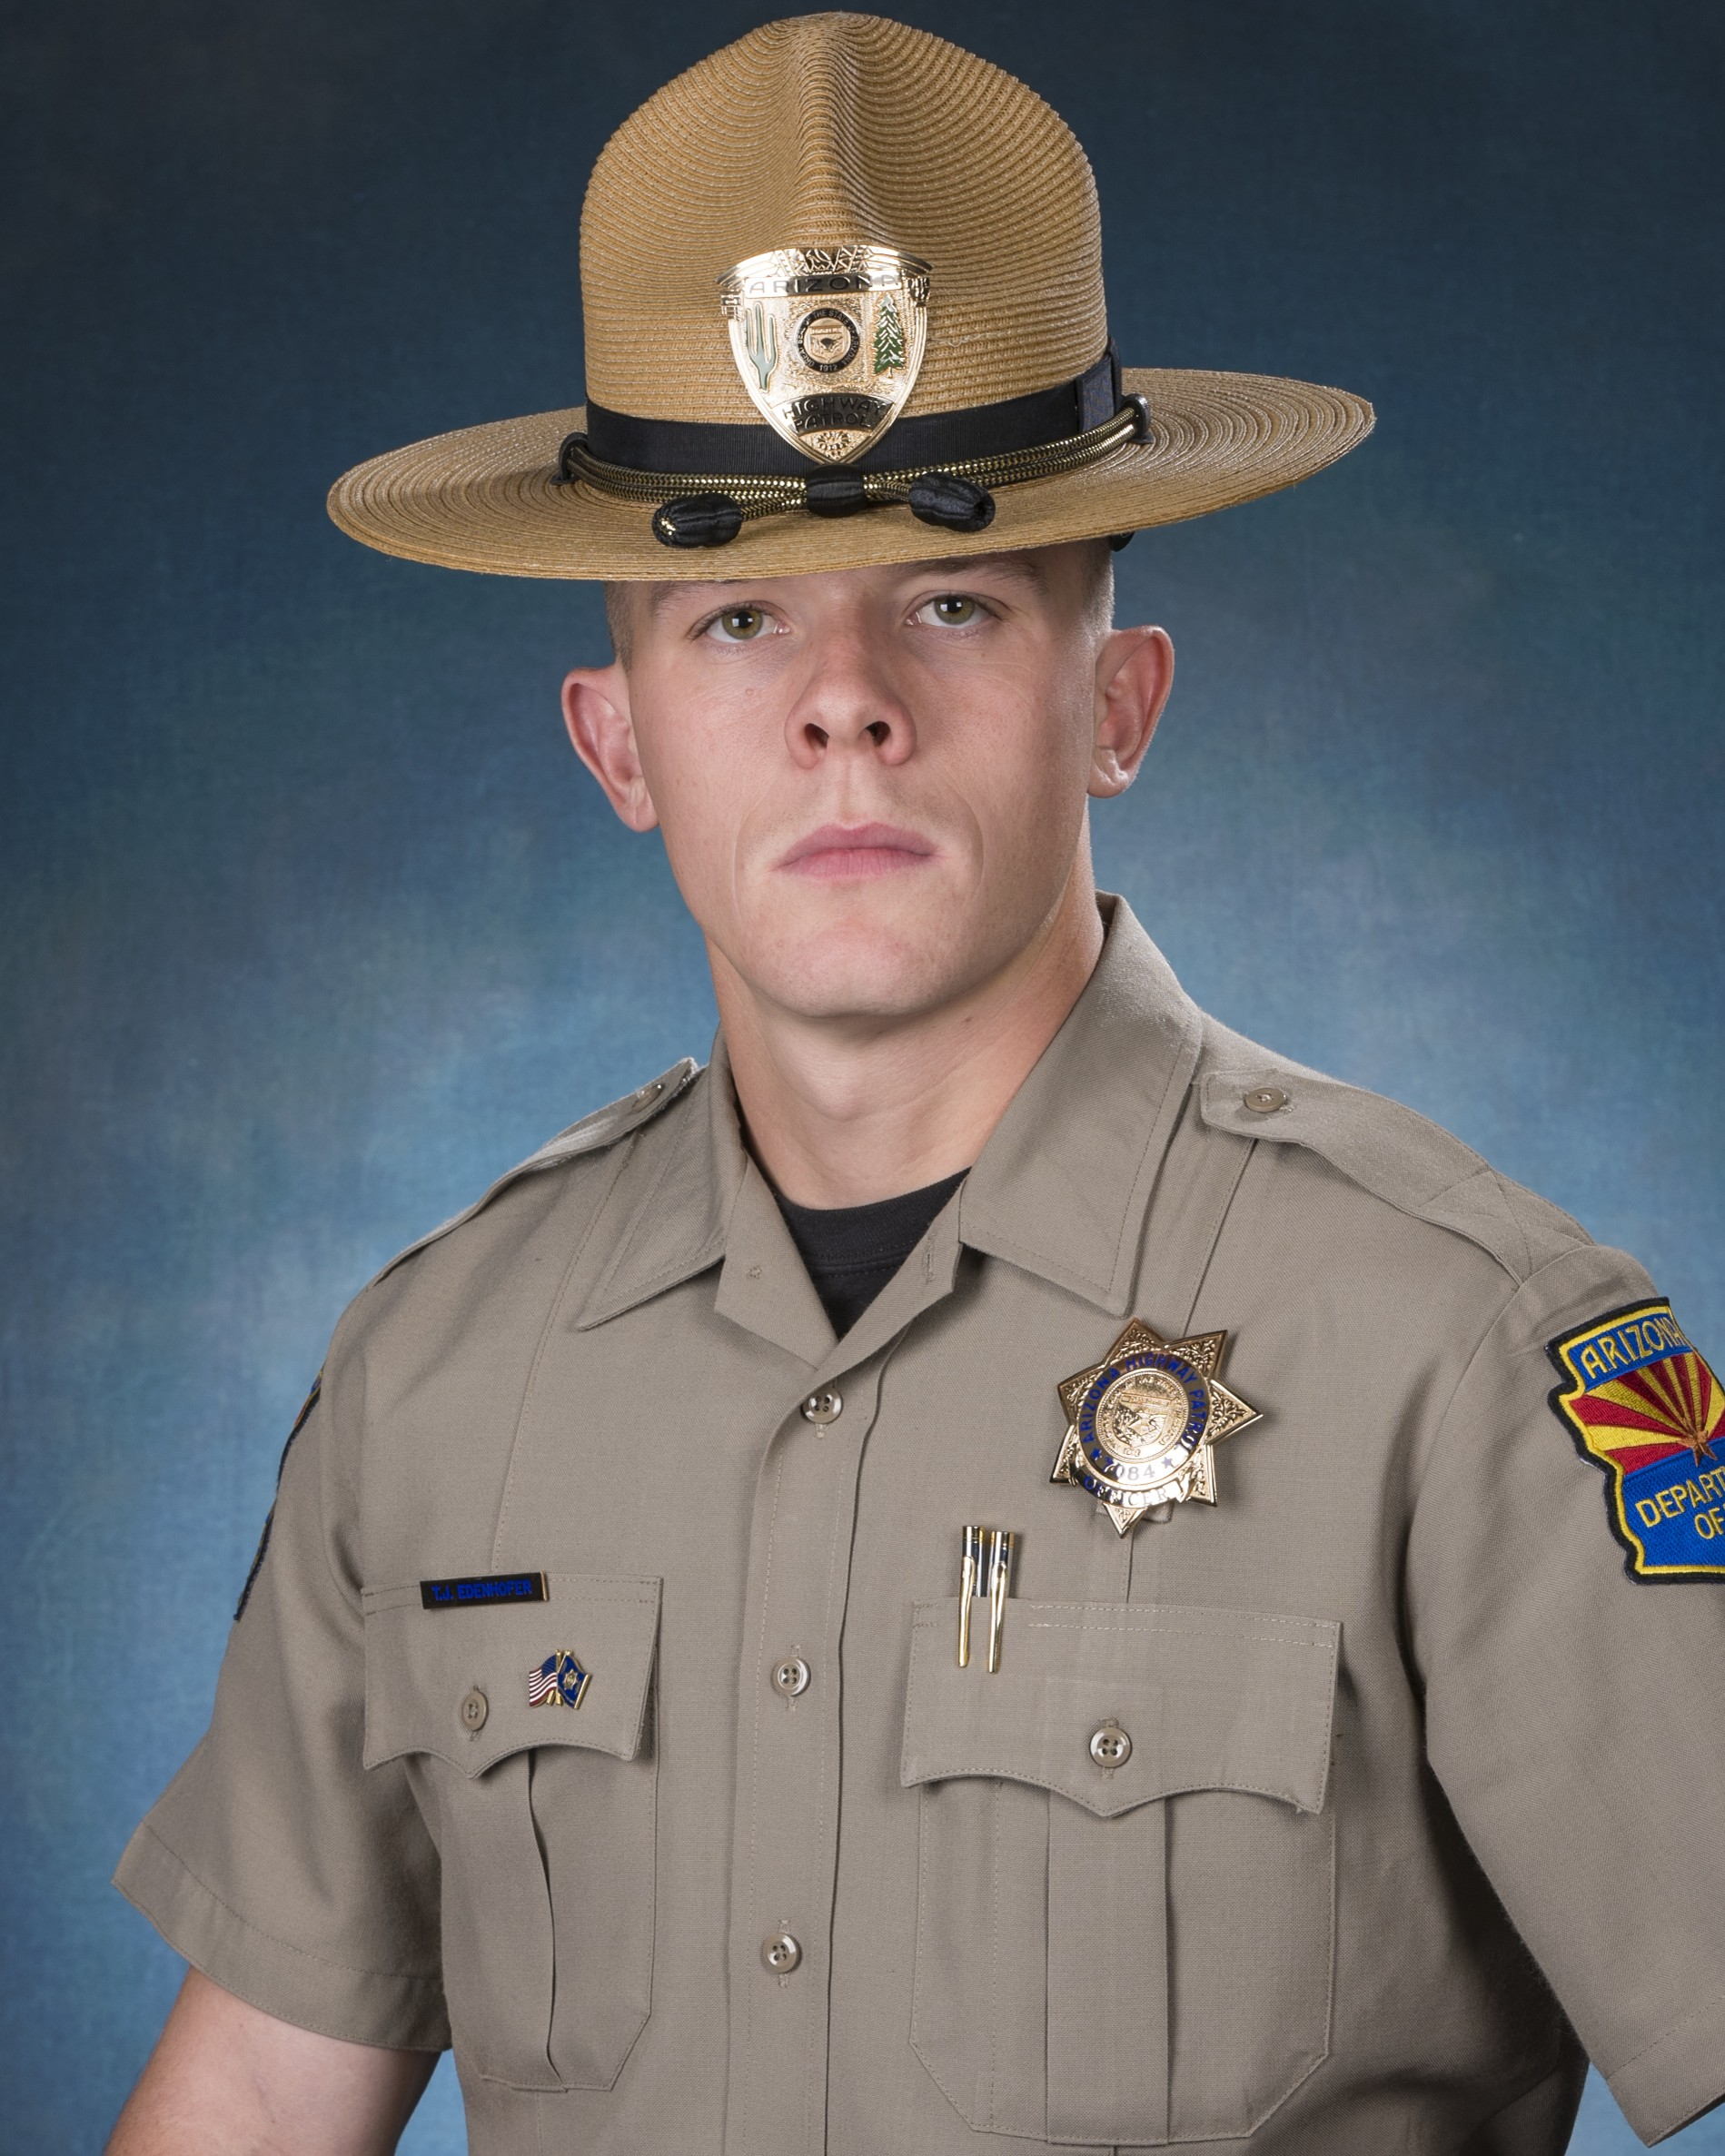 Trooper Tyler James Edenhofer